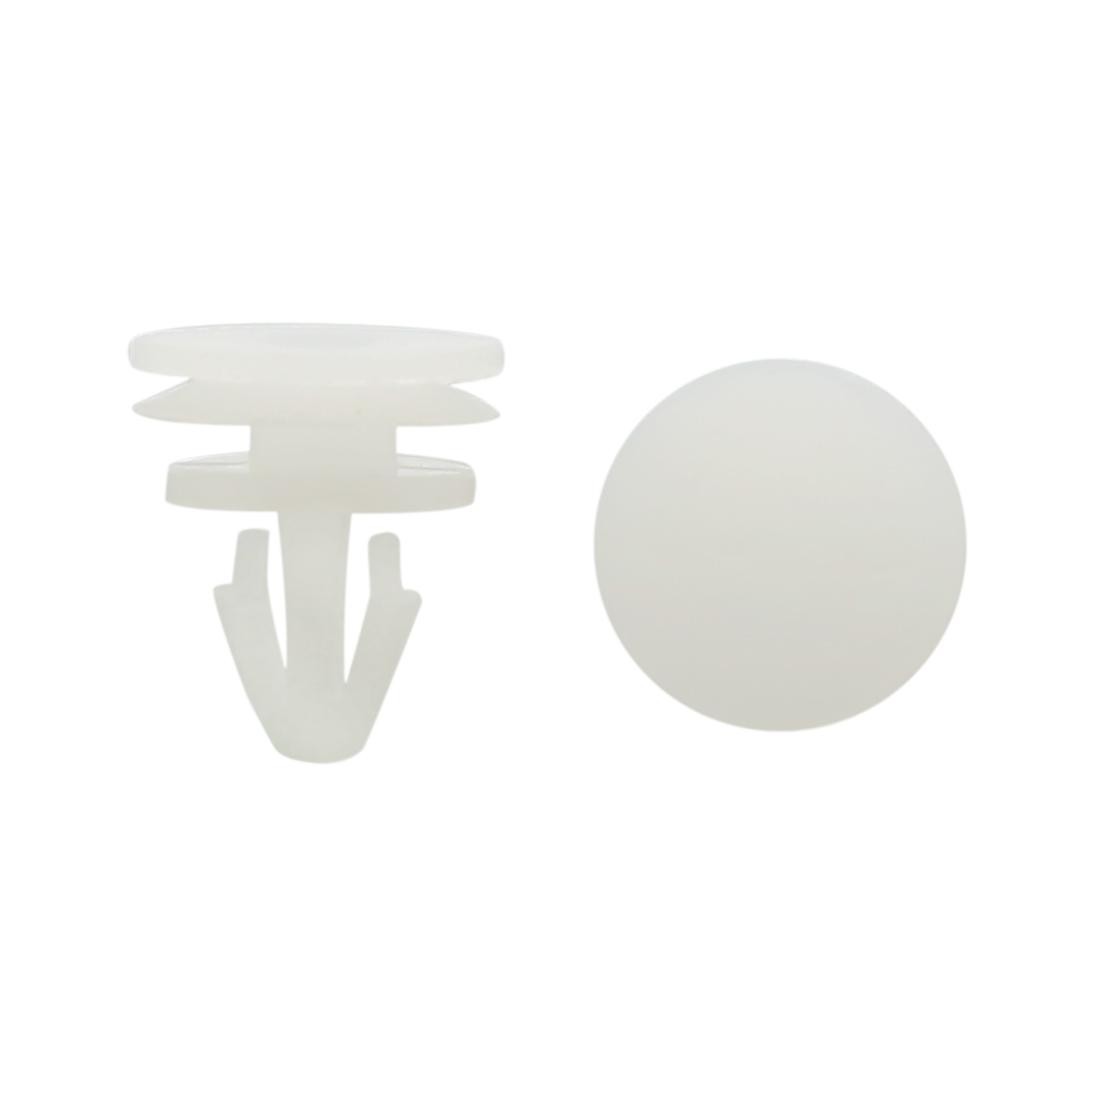 50 Pcs White Plastic Push-Type Bumper Retainer Rivet Clips 7mm x 9mm x 13mm